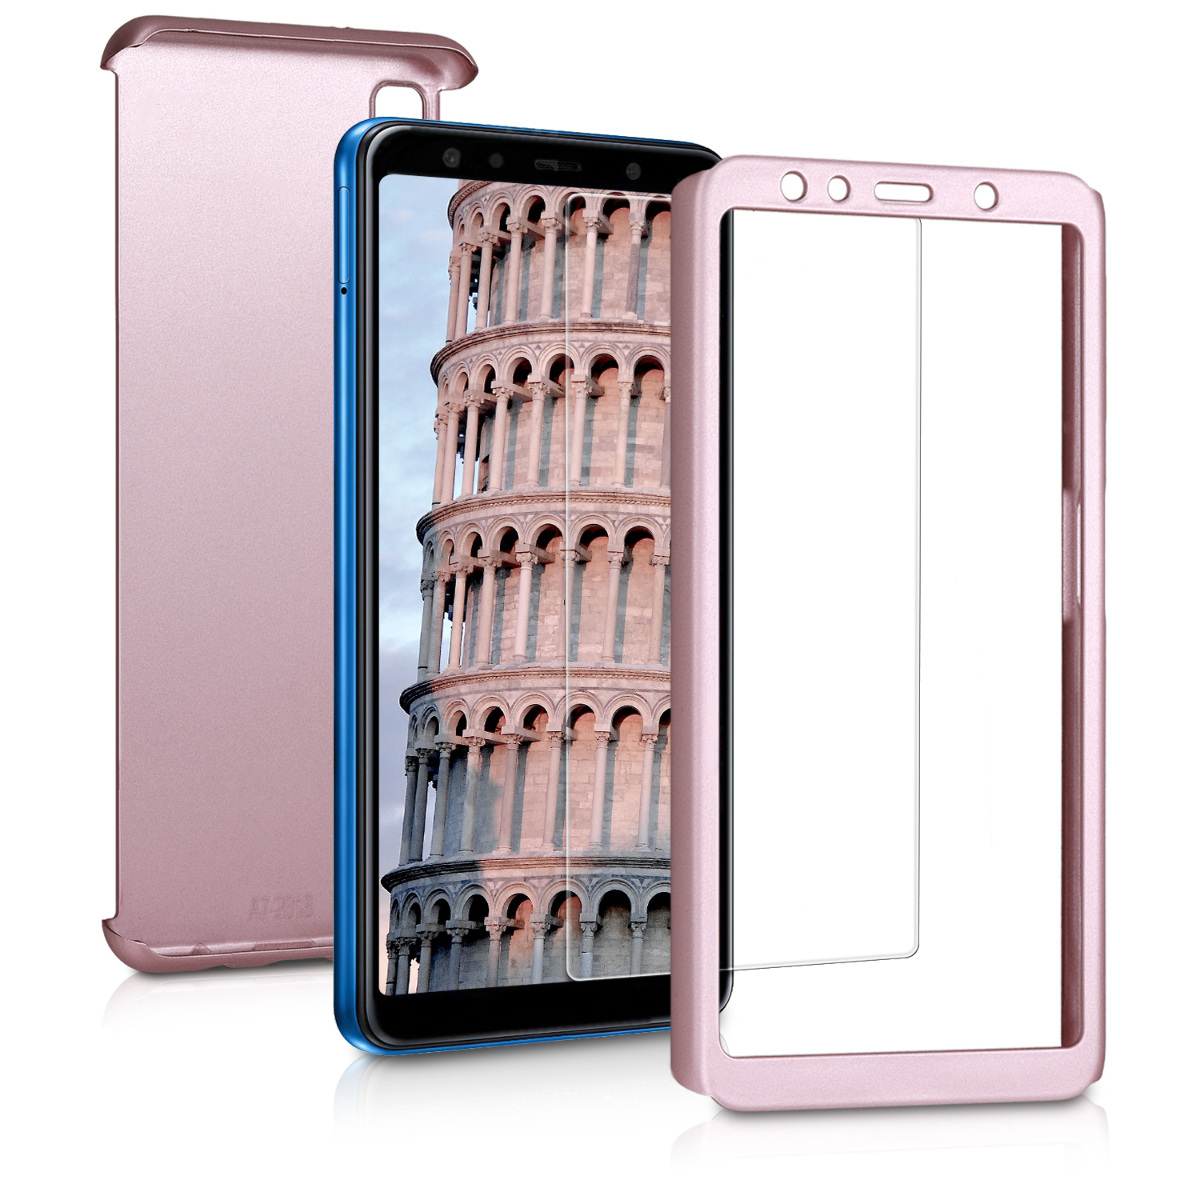 KW Θήκη Full Body Samsung Galaxy A7 2018 & Tempered Glass - Metallic Rose Gold (46423.31)